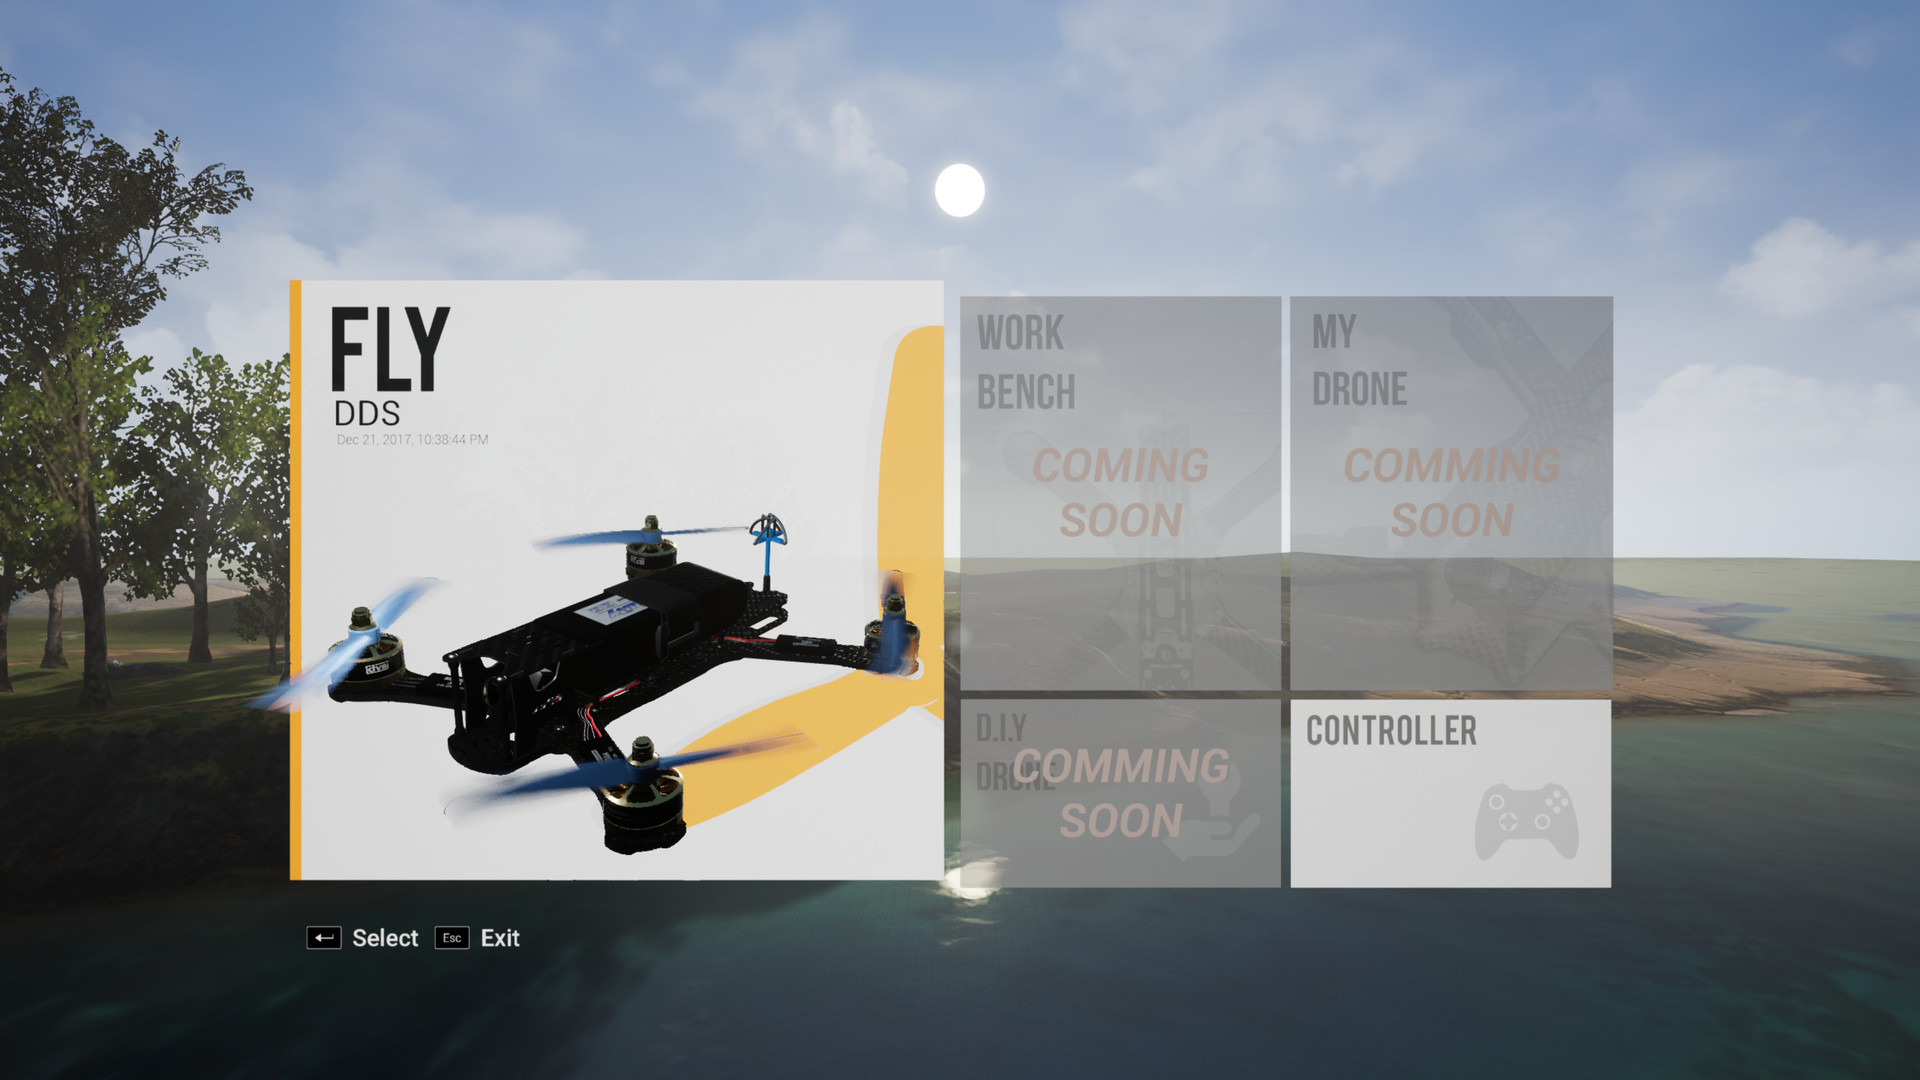 DDS (D I Y Drone Simulator) - Press Kit